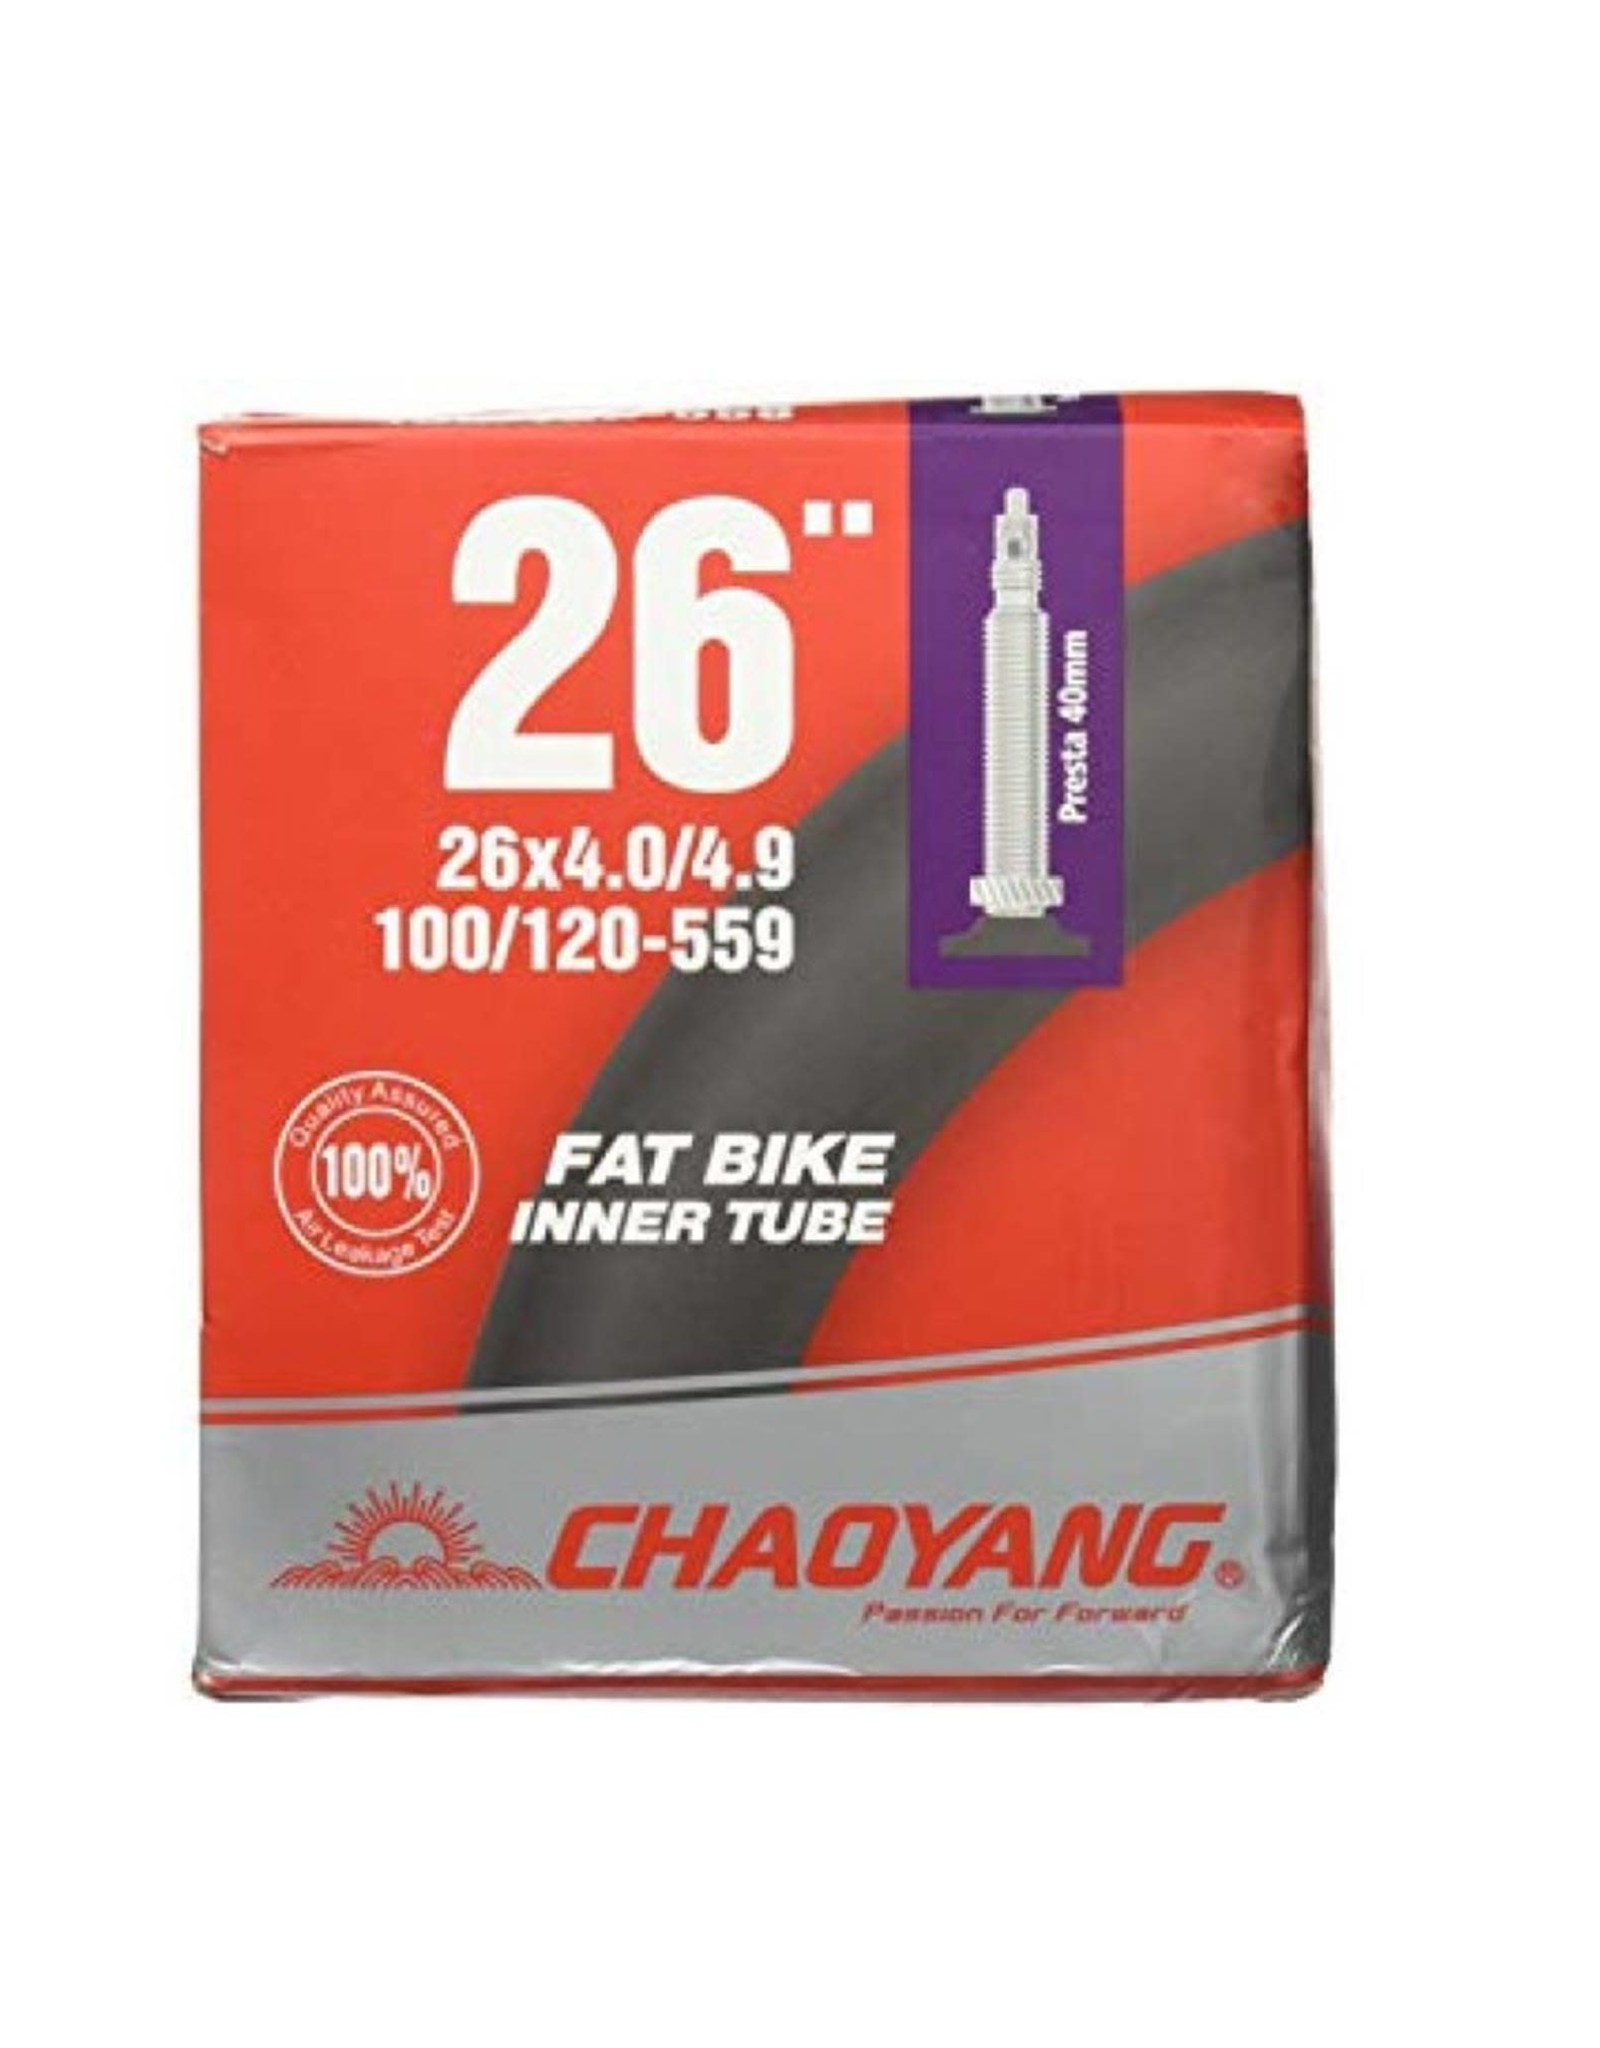 Chaoyang 26 x 4.0/4.9 Fat Bike Presta Tube